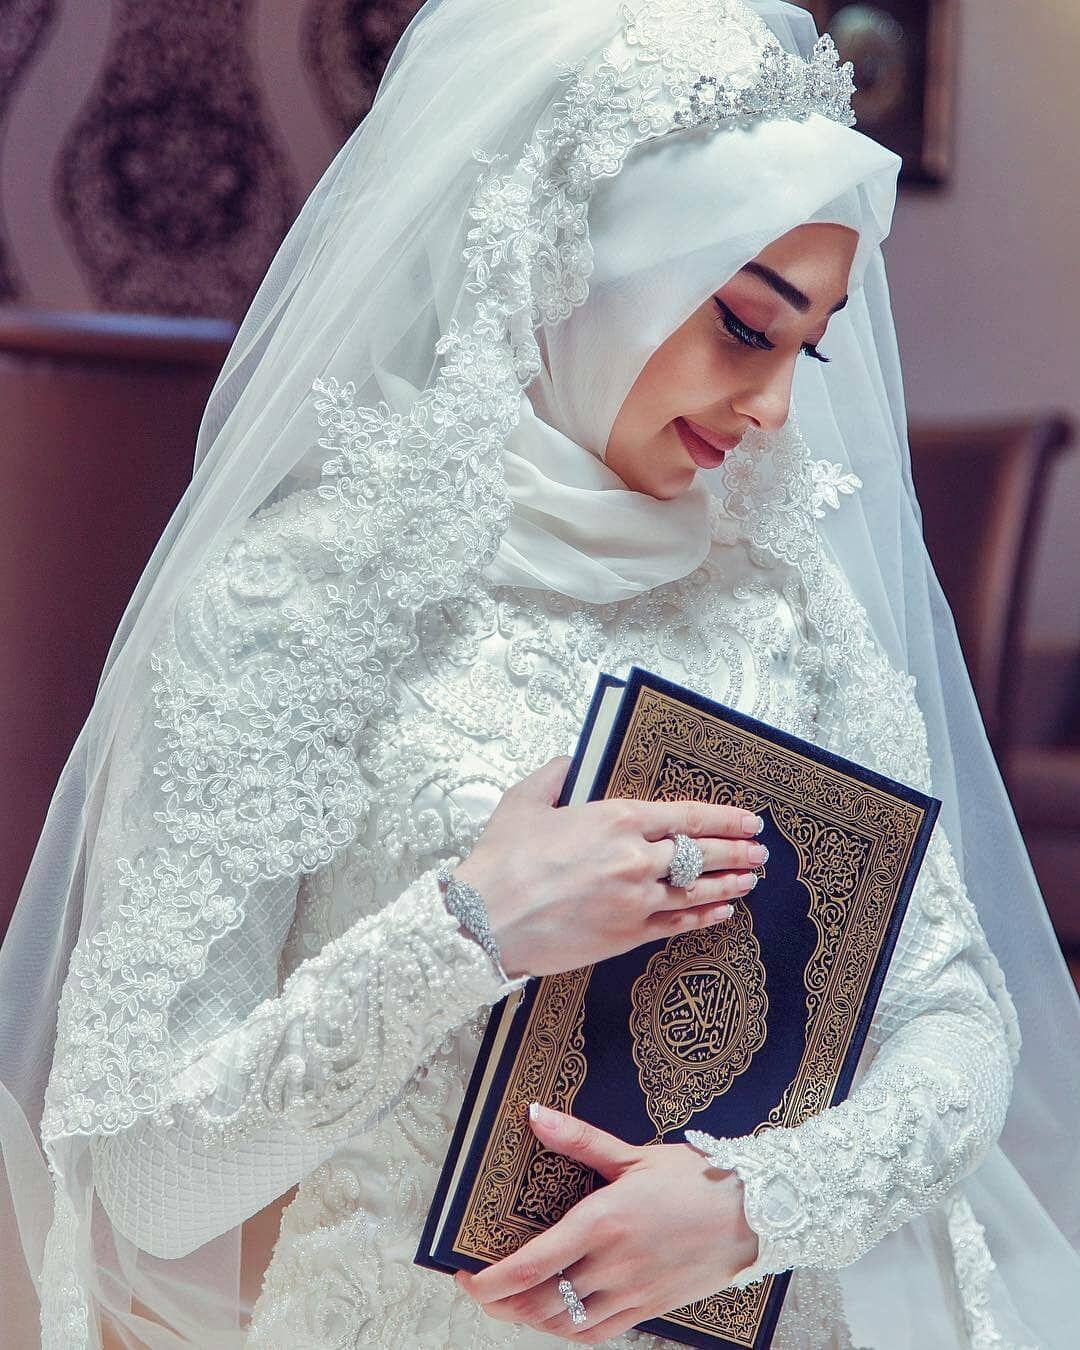 Pin By Rifrif On Hijab Pictures Muslim Wedding Hijab Arab Girls Hijab Muslimah Wedding